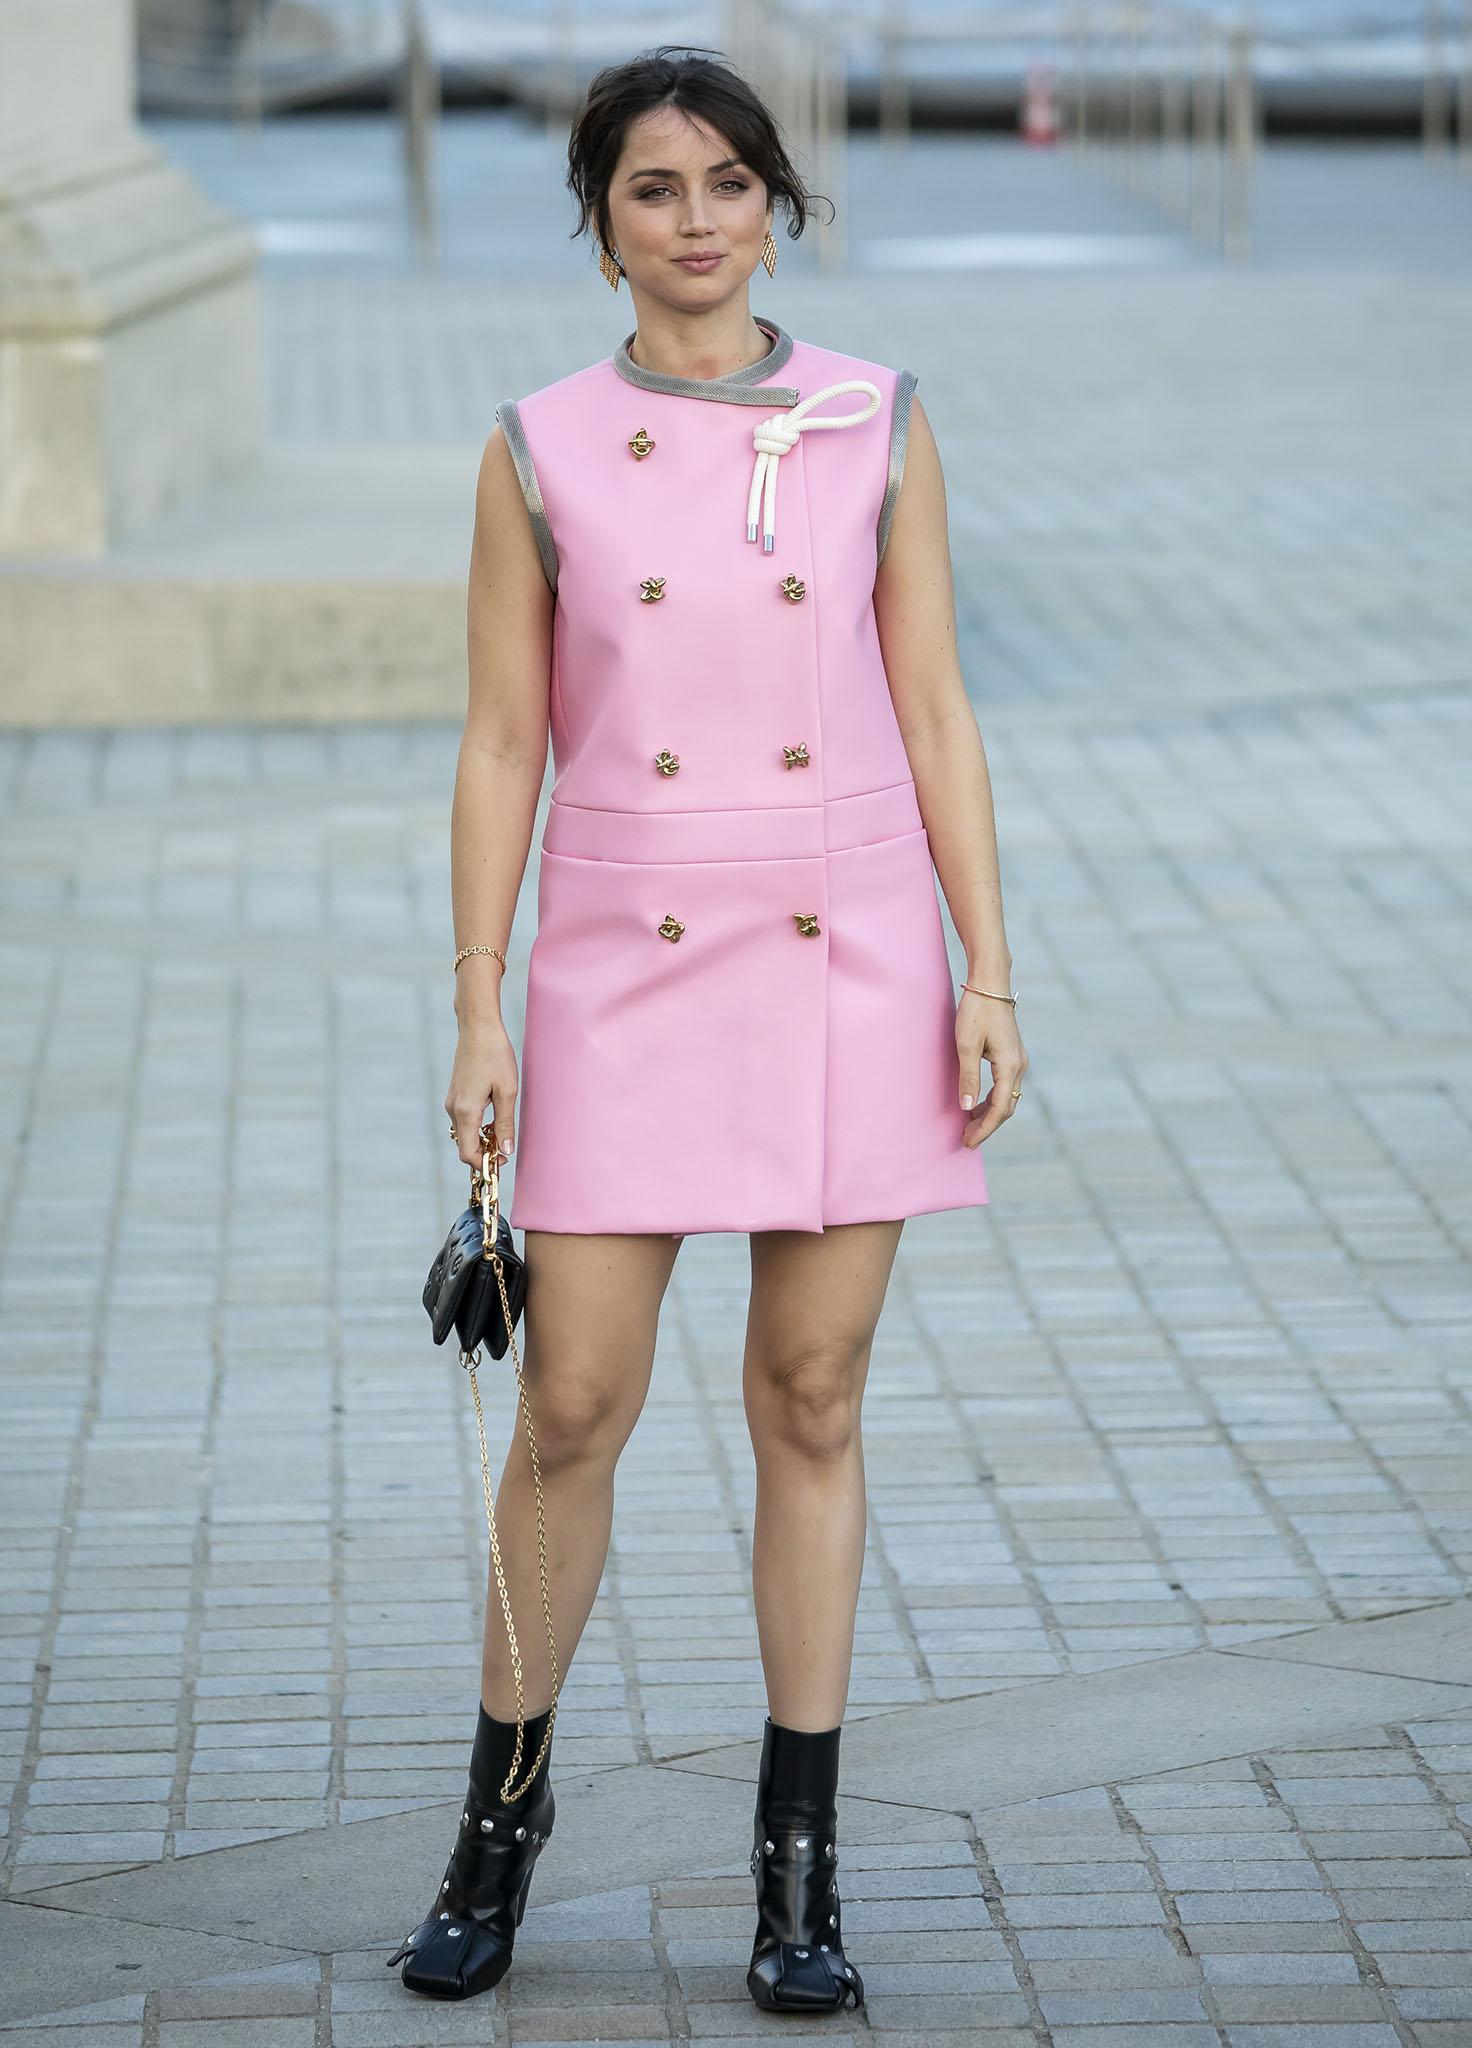 Ana de Armas at the Louis Vuitton Womenswear Spring/Summer 2022 show as part of Paris Fashion Week on October 5, 2021